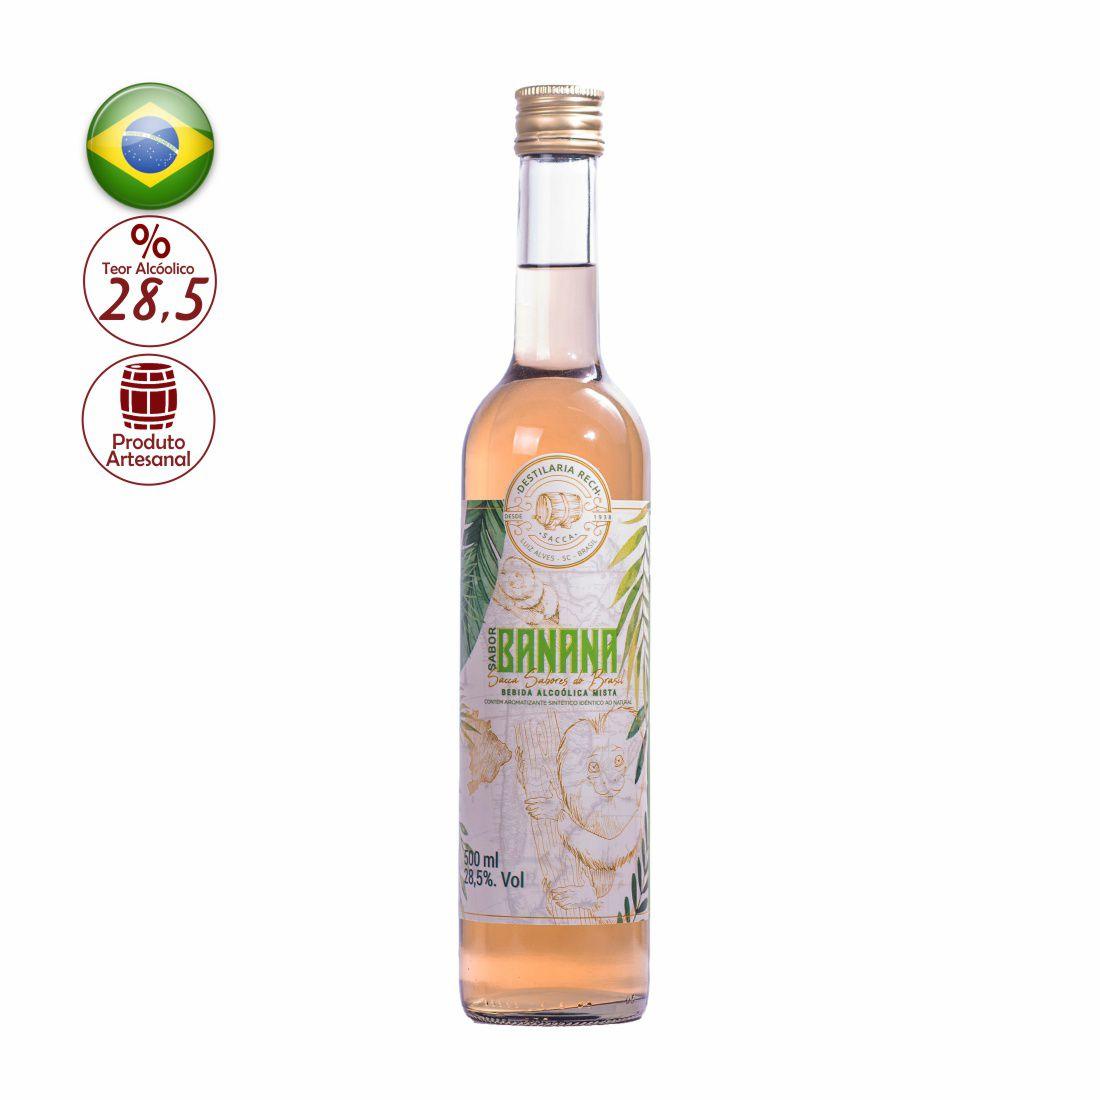 BEBIBA ALCOOLICA MISTA SACCA 500 ML BANANA